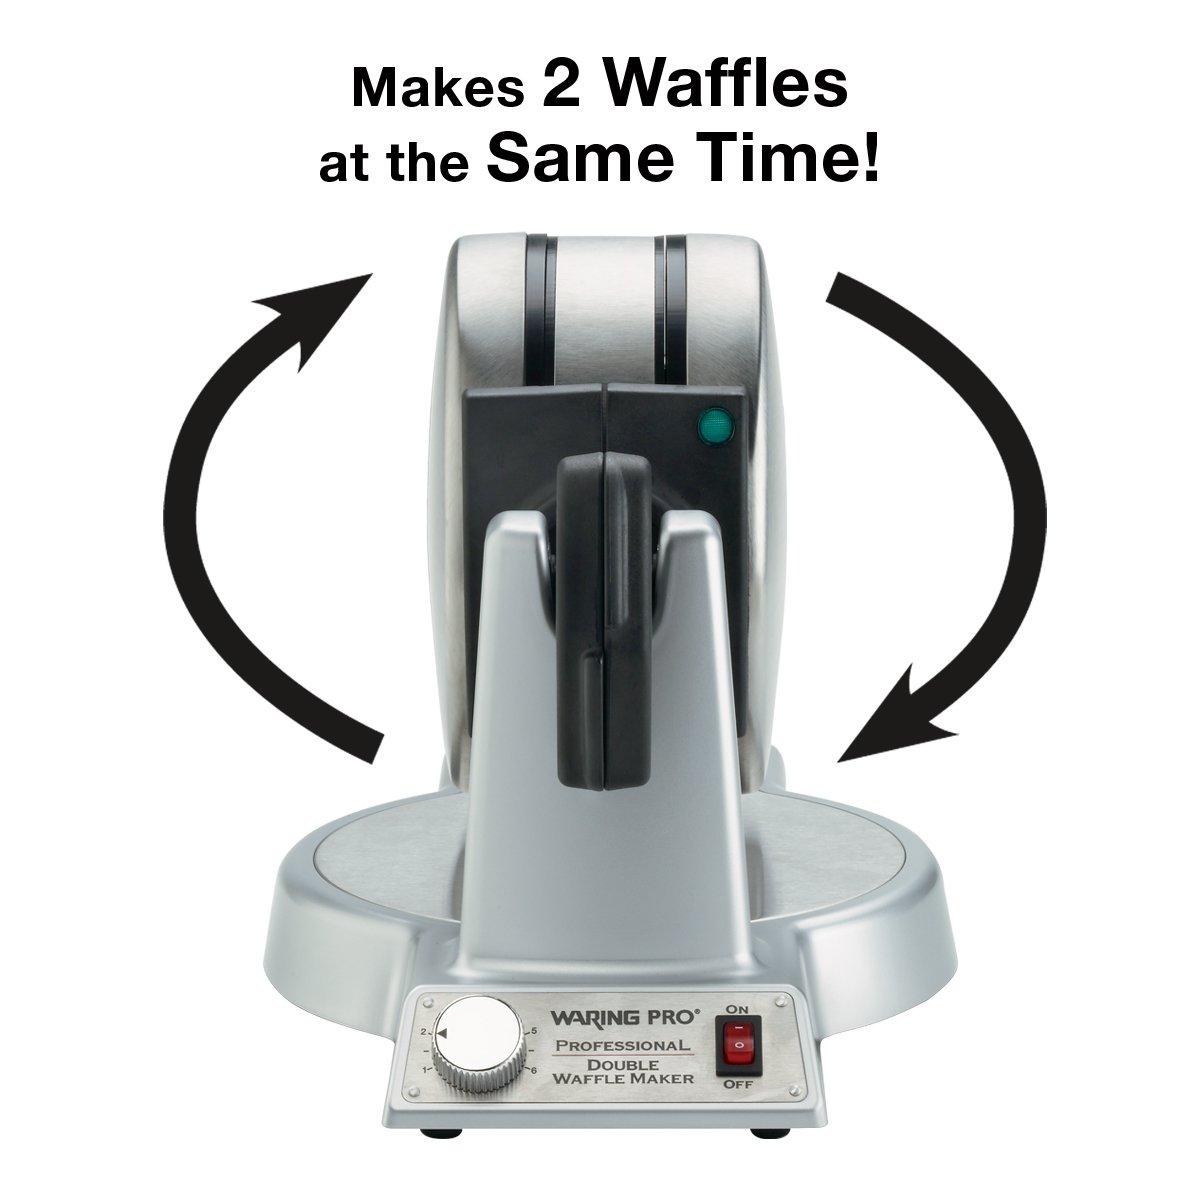 Waring Pro WMK600 Double Belgian Waffle Maker Review